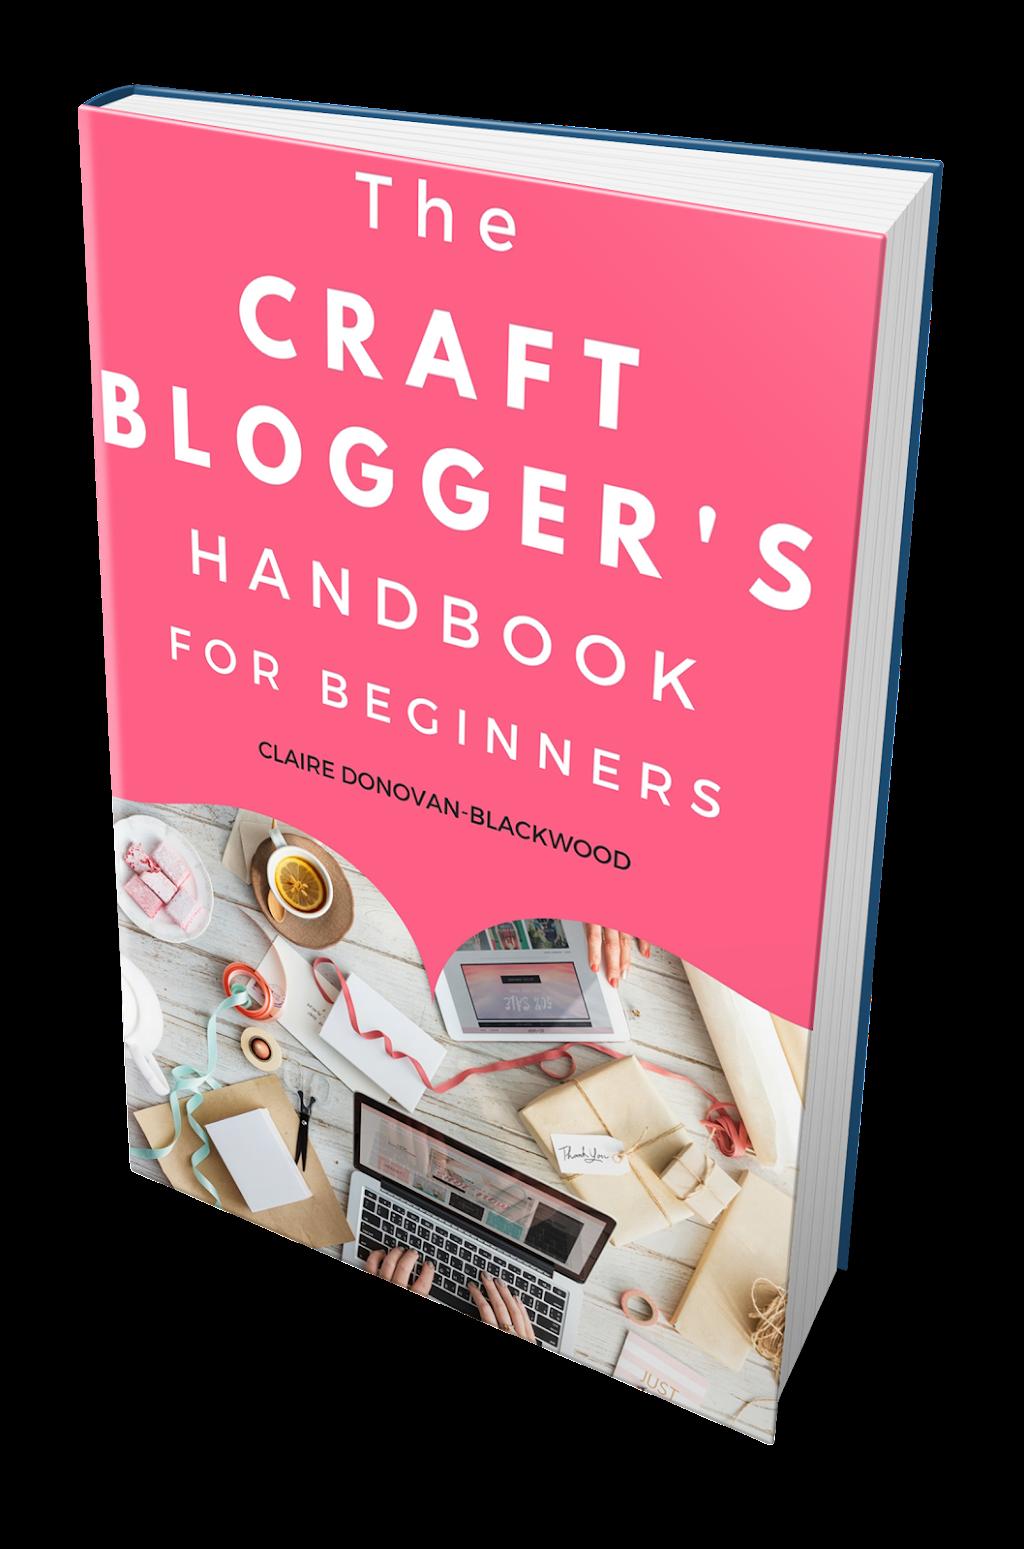 The Craft Blogger's Handbook - How To Start A Craft Blog